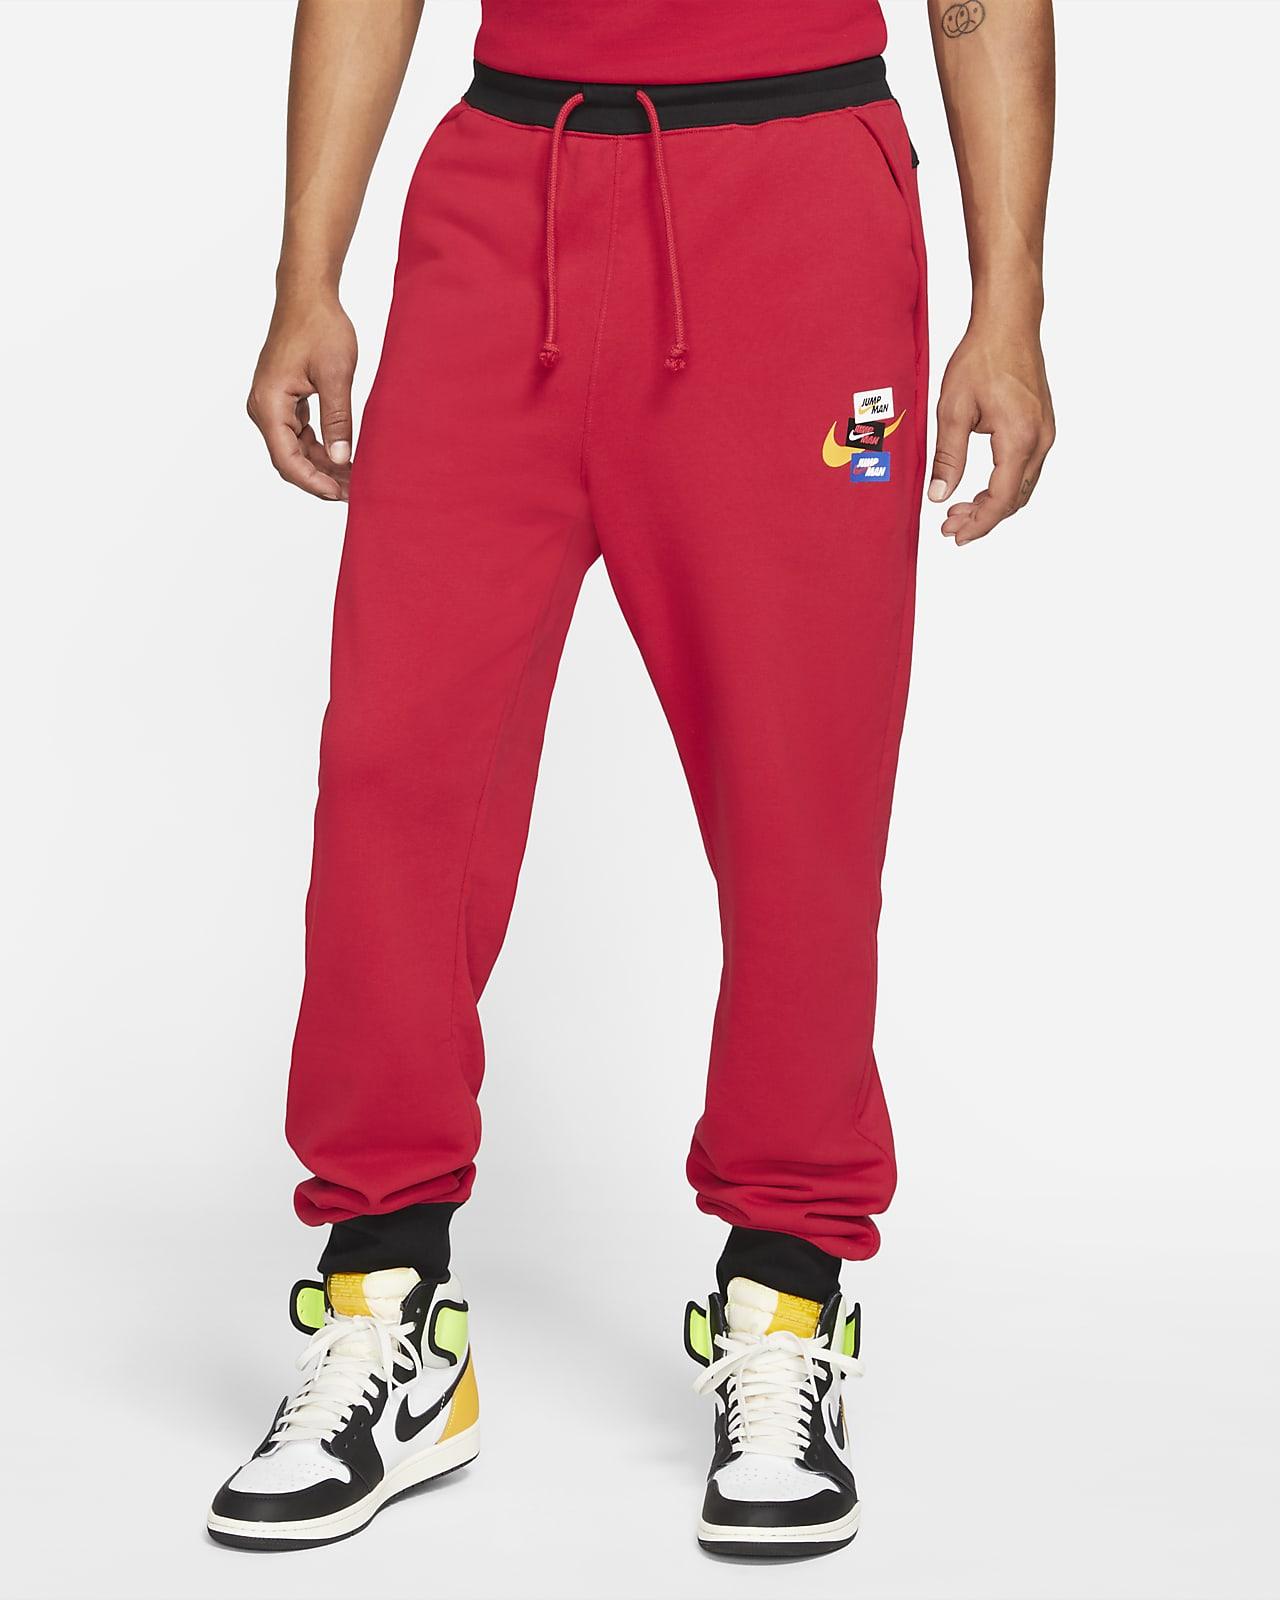 Jordan Jumpman Men's Trousers